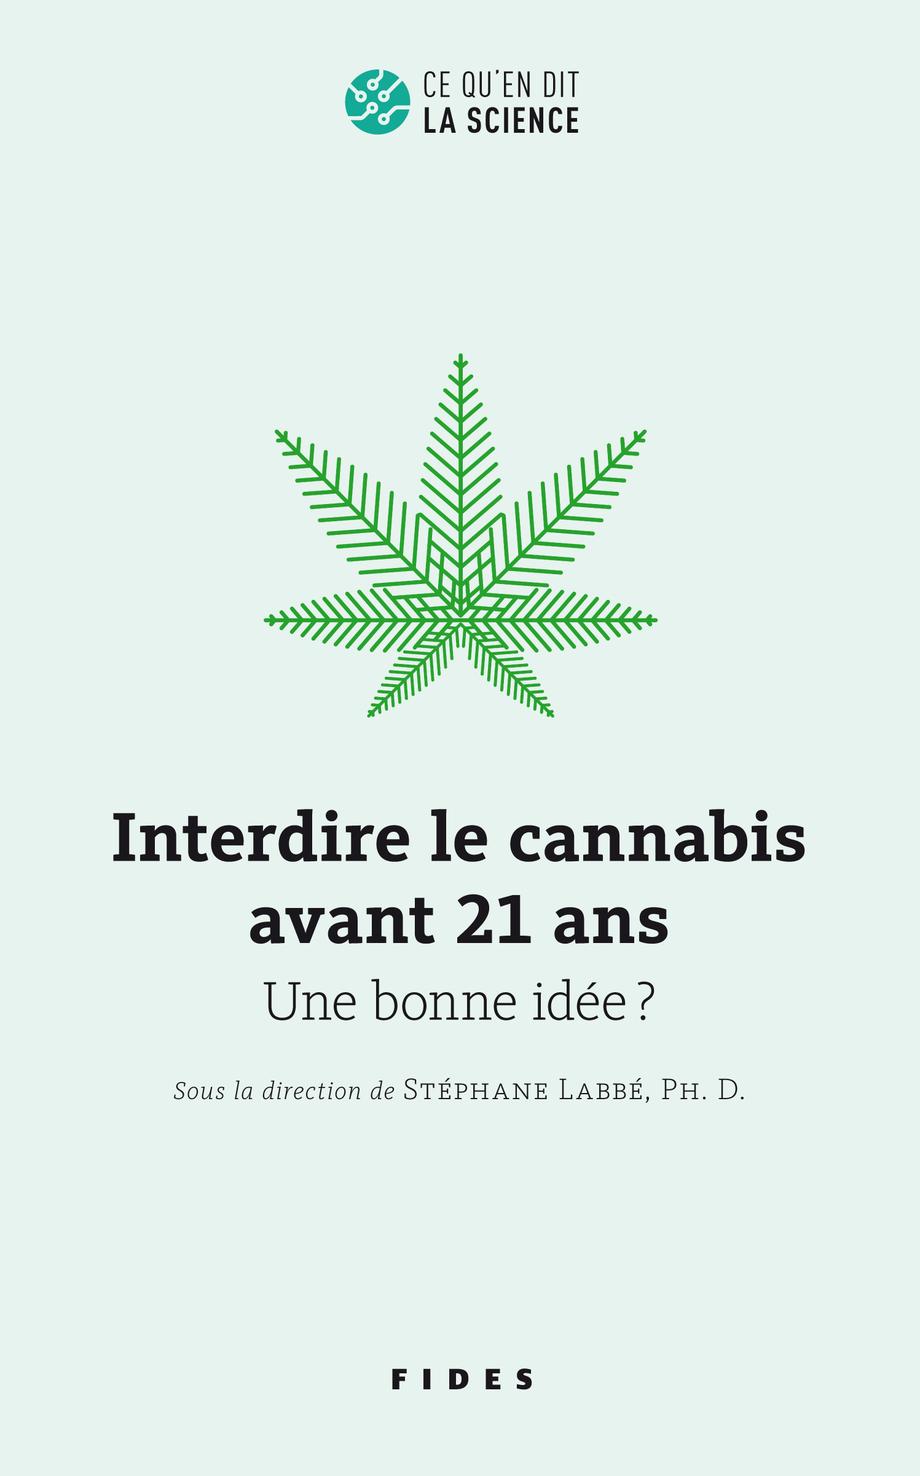 Interdire le cannabis avant 21 ans